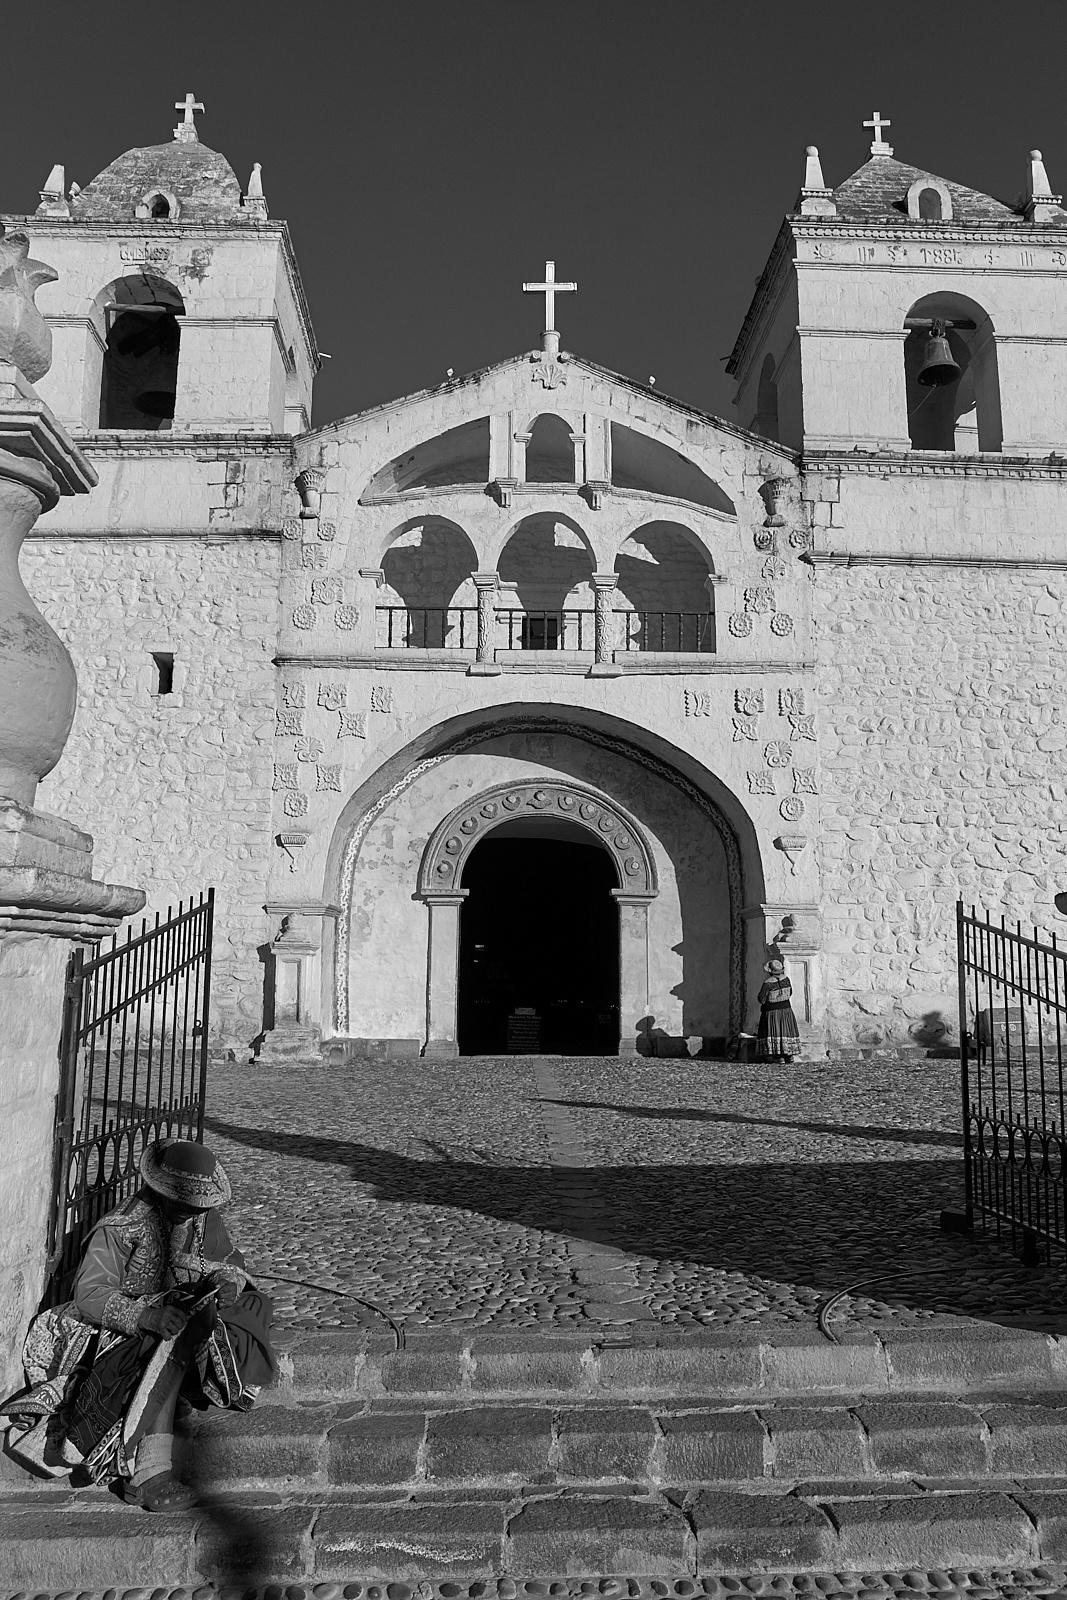 Iglesia Santa Ana de Maca, Provincia de Caylloma, Perú. - Single Shot - Eduardo Cerda-Sánchez, Fotografia